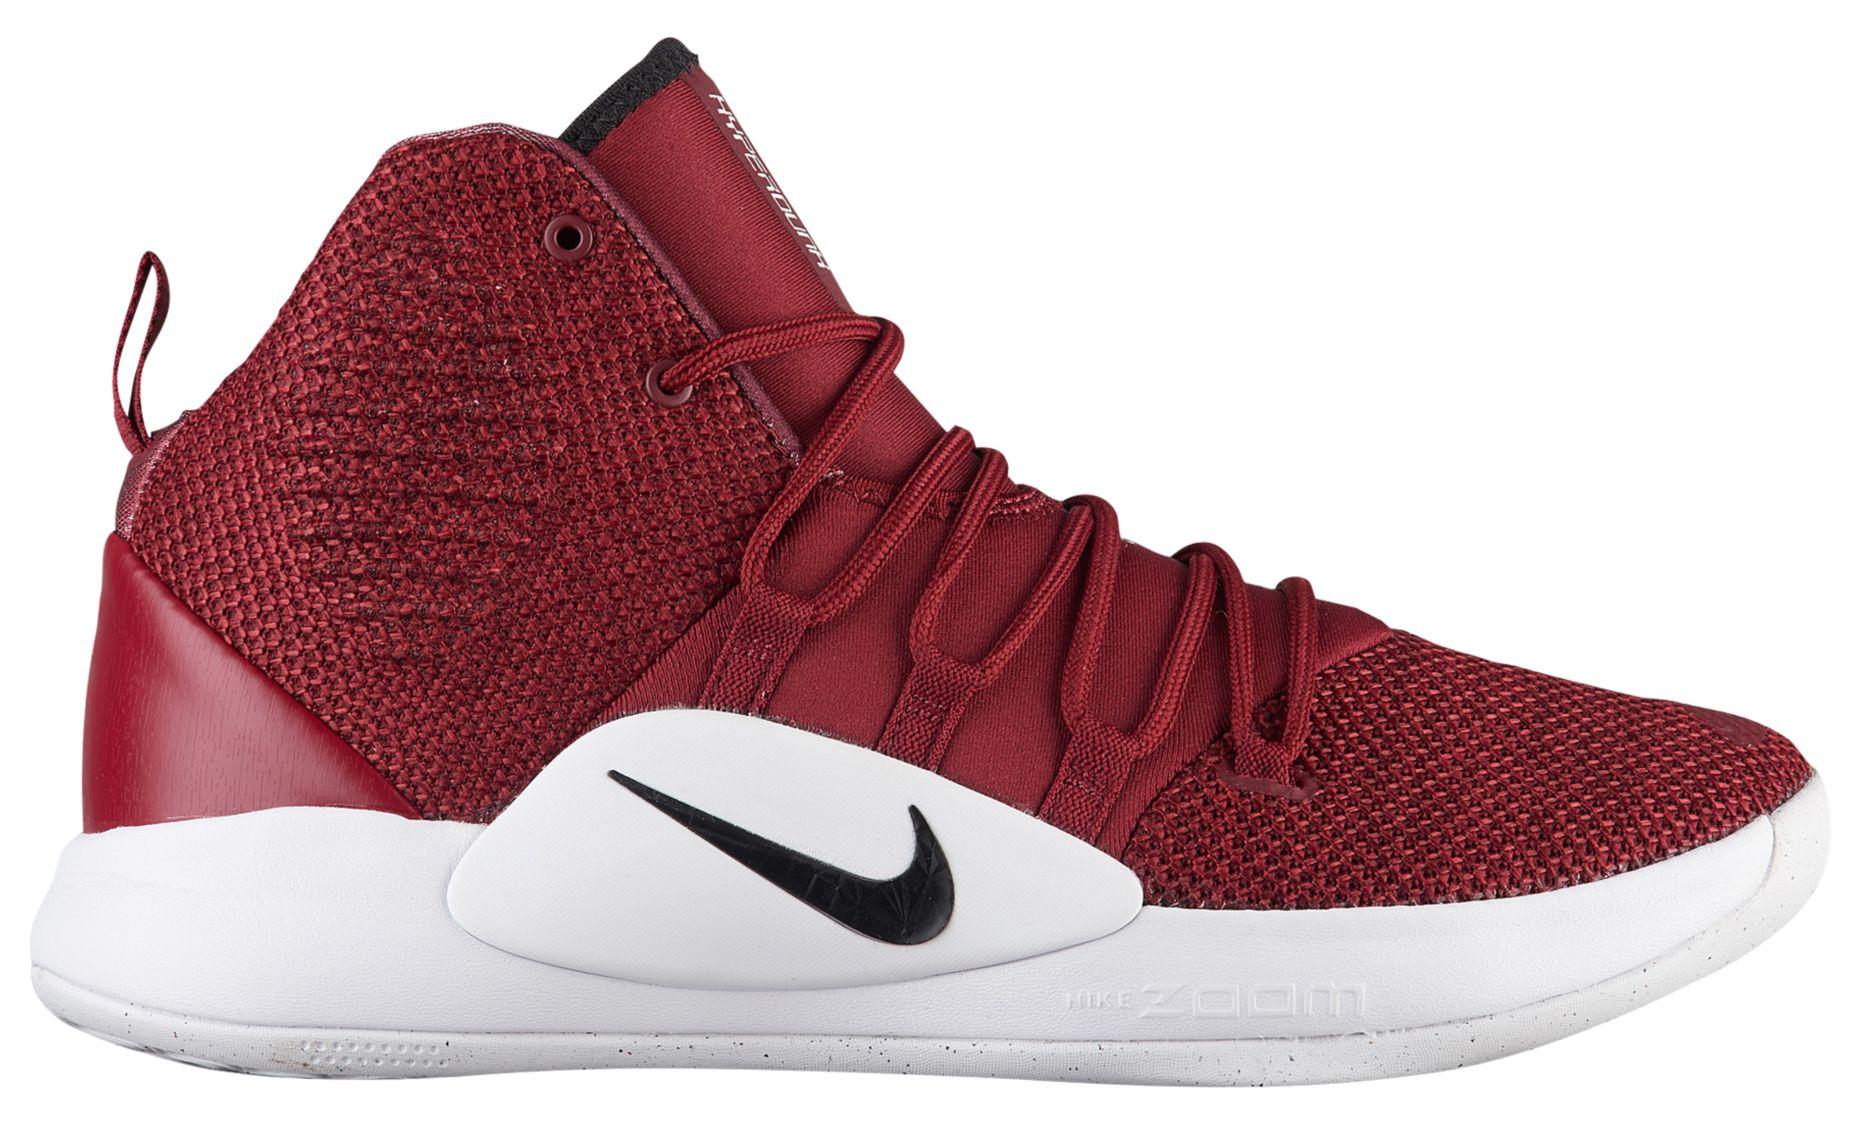 new style 4ec23 12cc6 The 2018 Nike Hyperdunk X Finally Has a Release Date - WearTesters